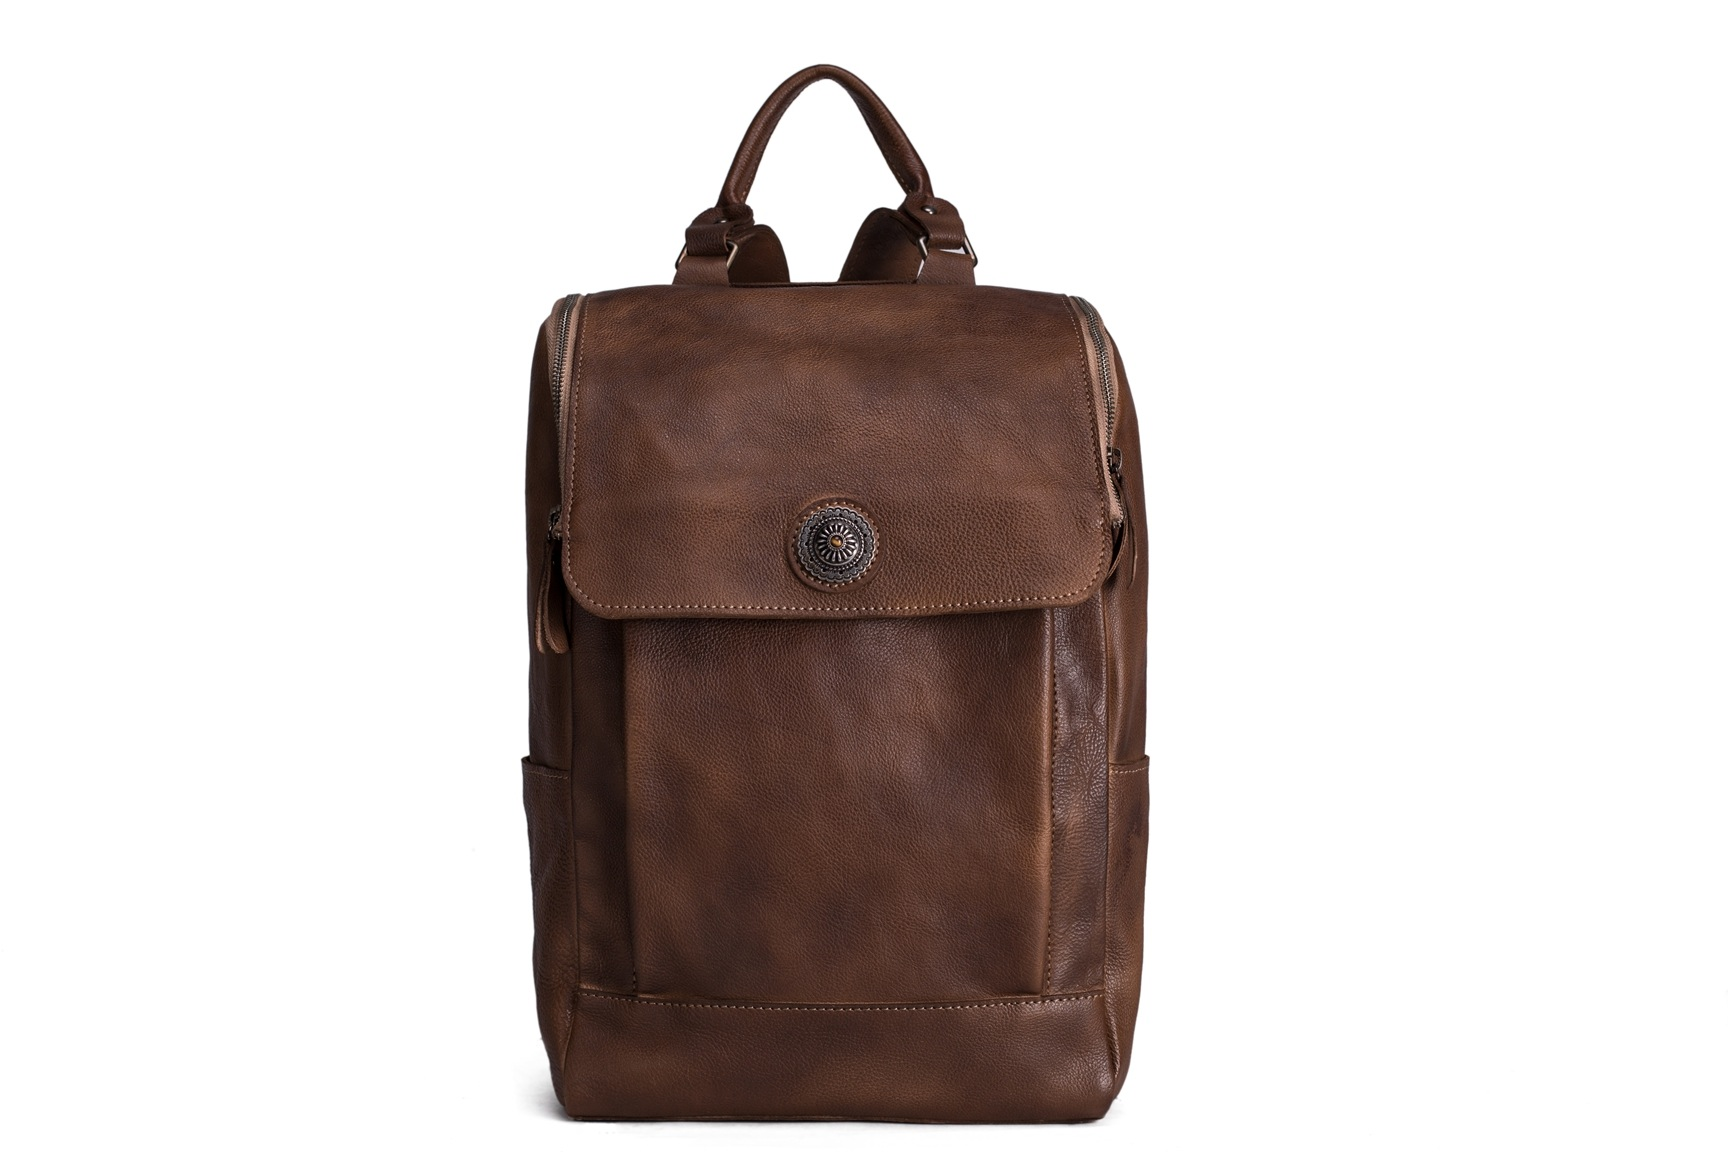 Vegetable Tanned Leather Backpack/ Travel Backpack/ School Backpack 9026